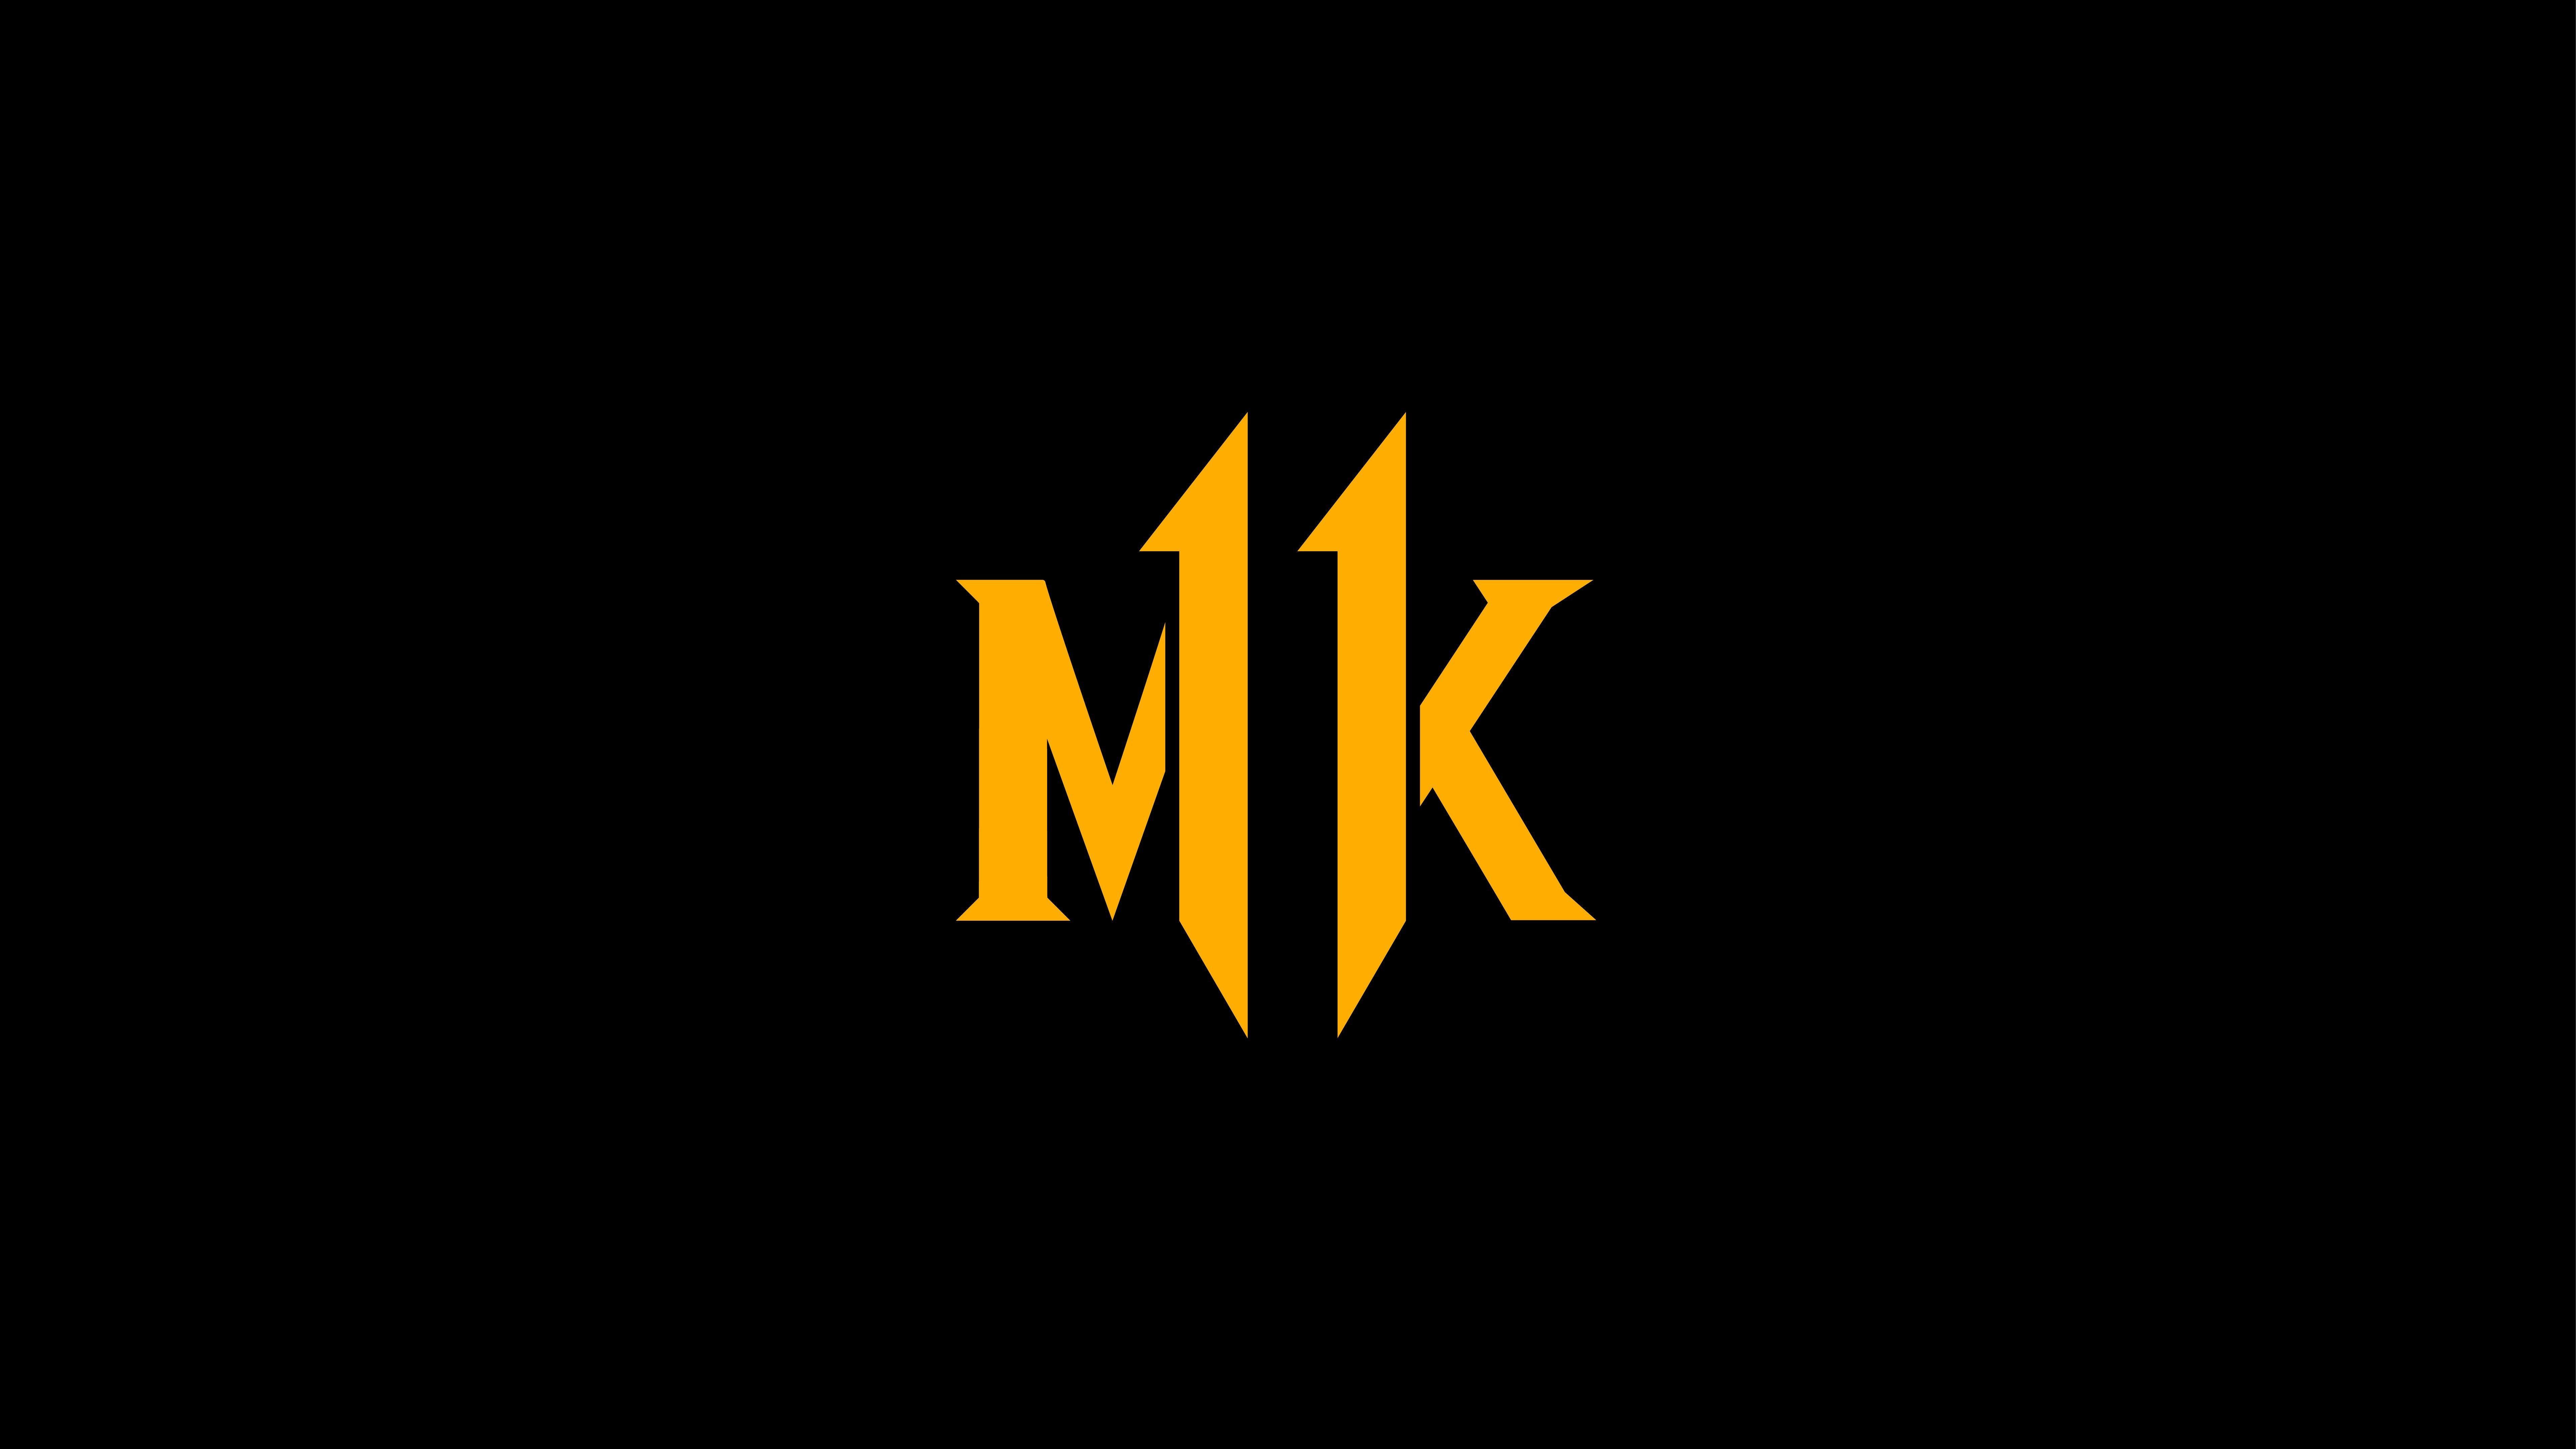 Fondos de pantalla Mortal Kombat 11 Logo MK